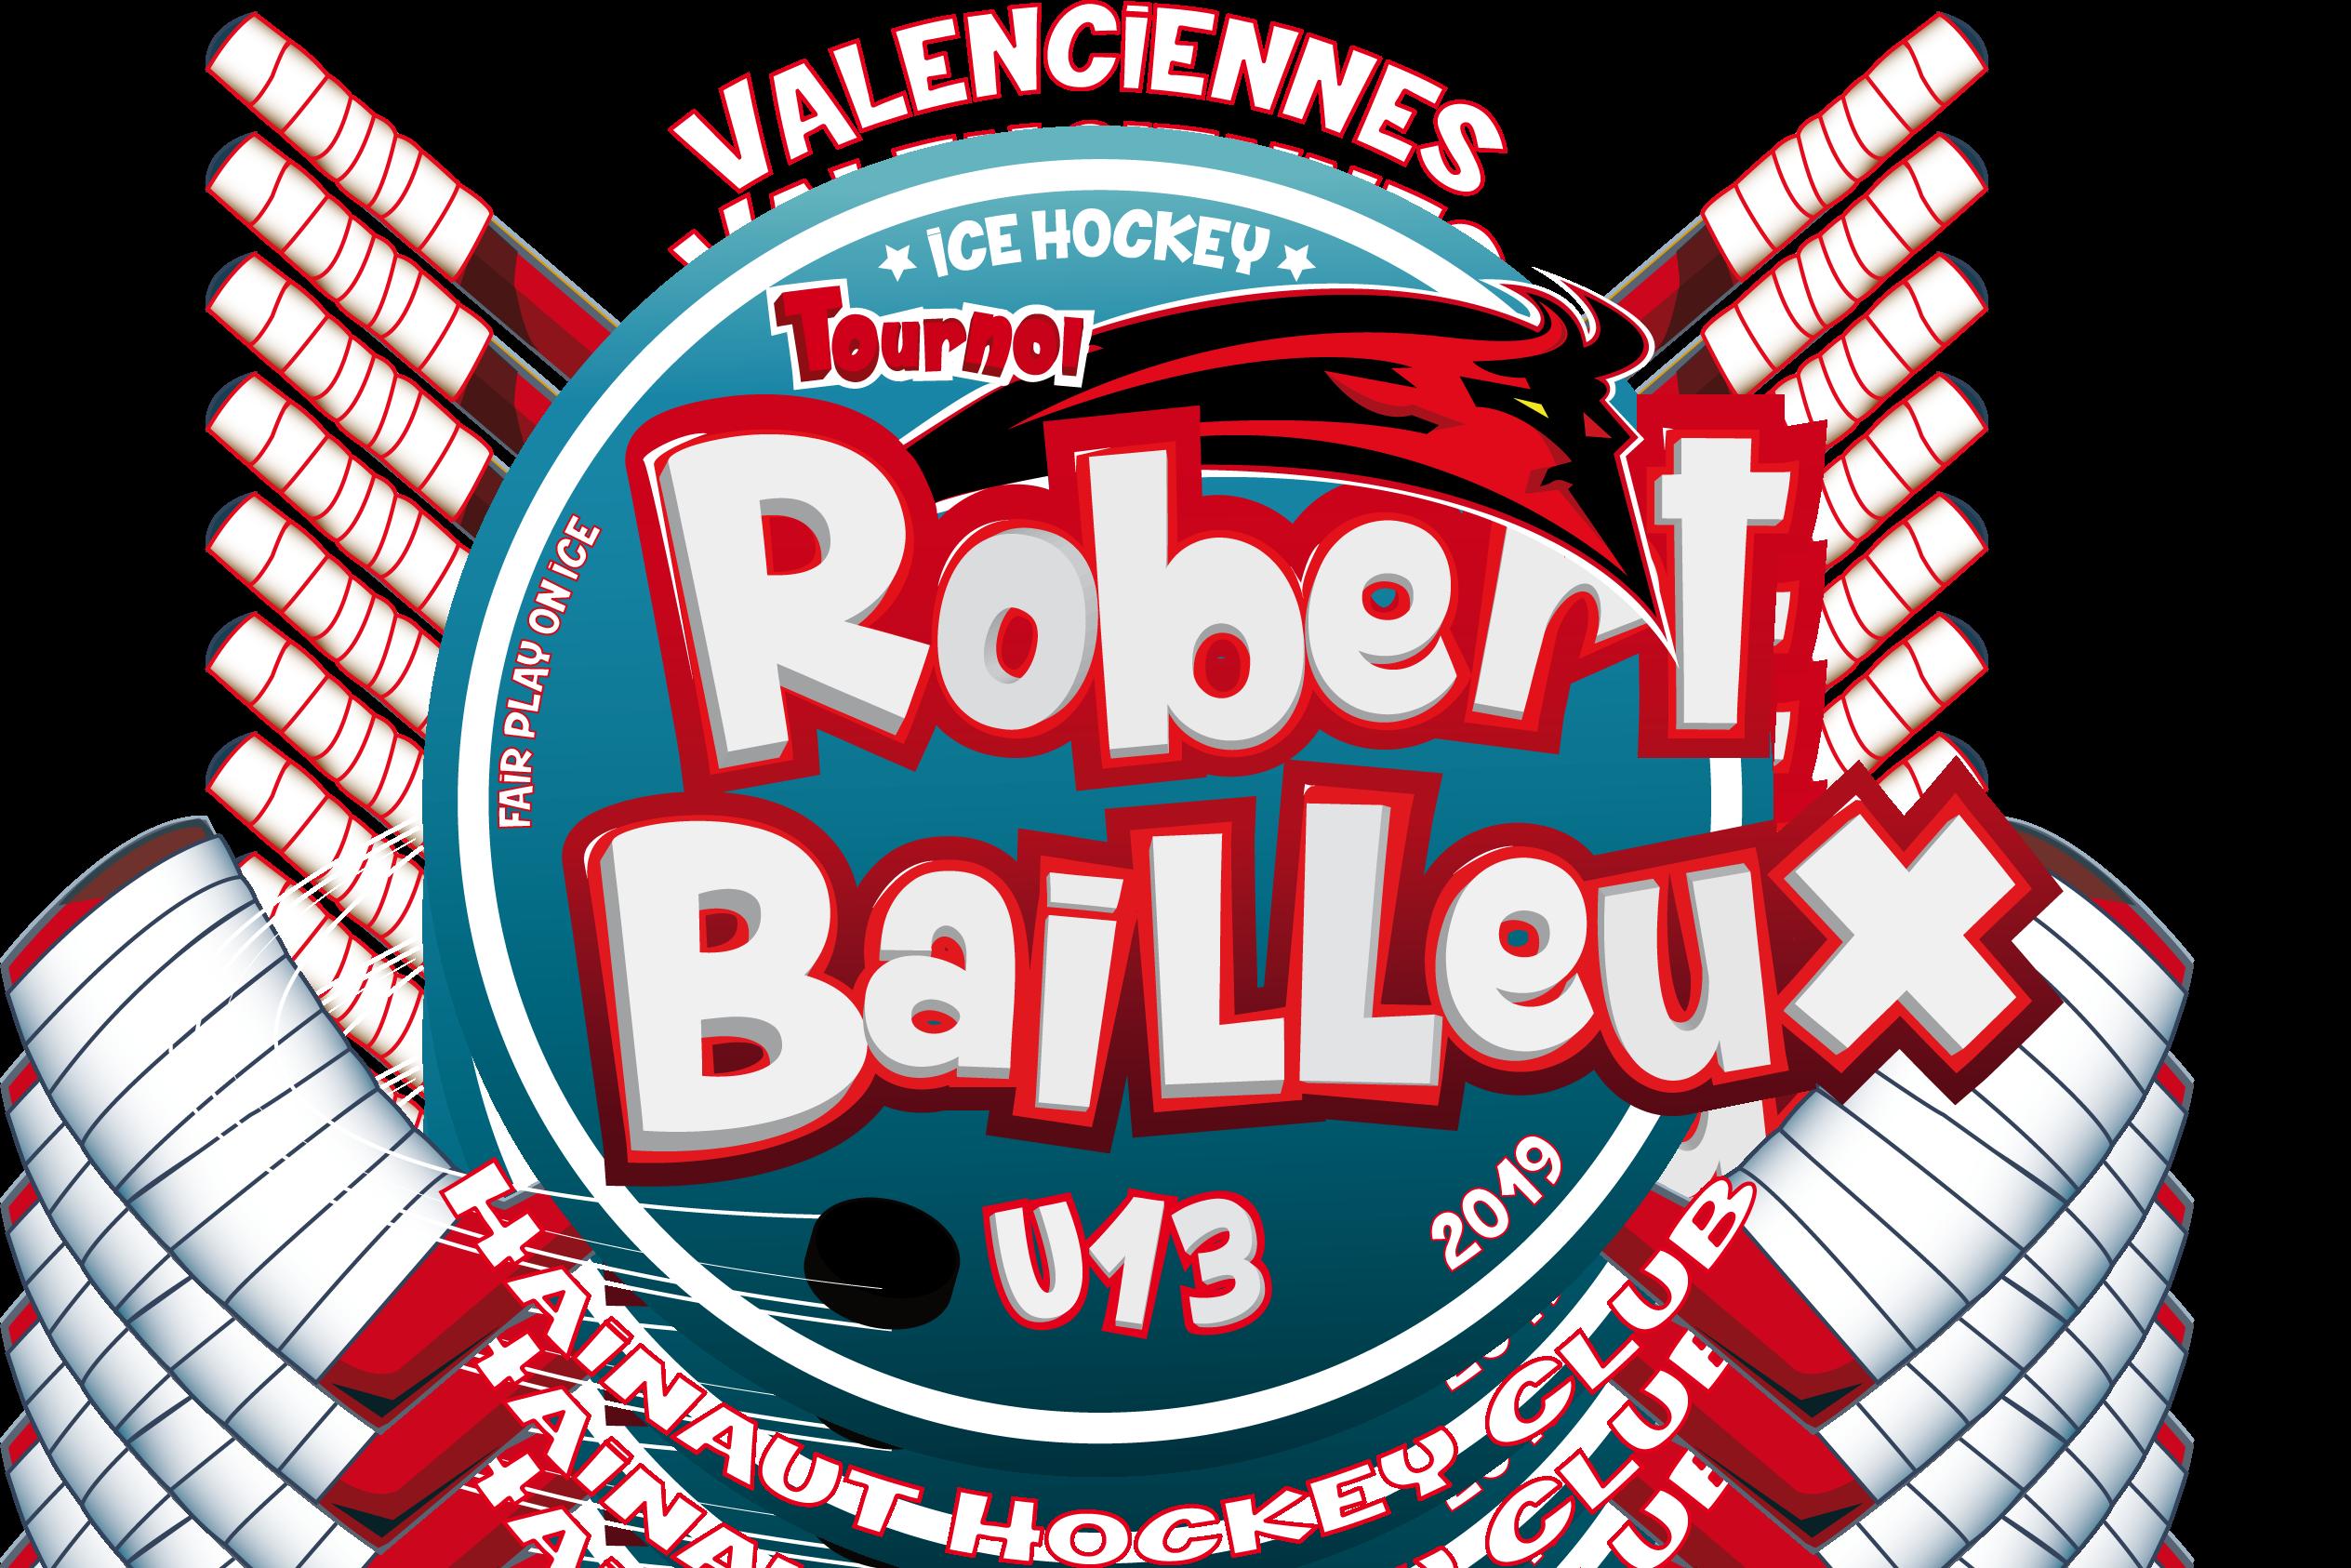 Tournoi U13 Robert Bailleux – édition 2019